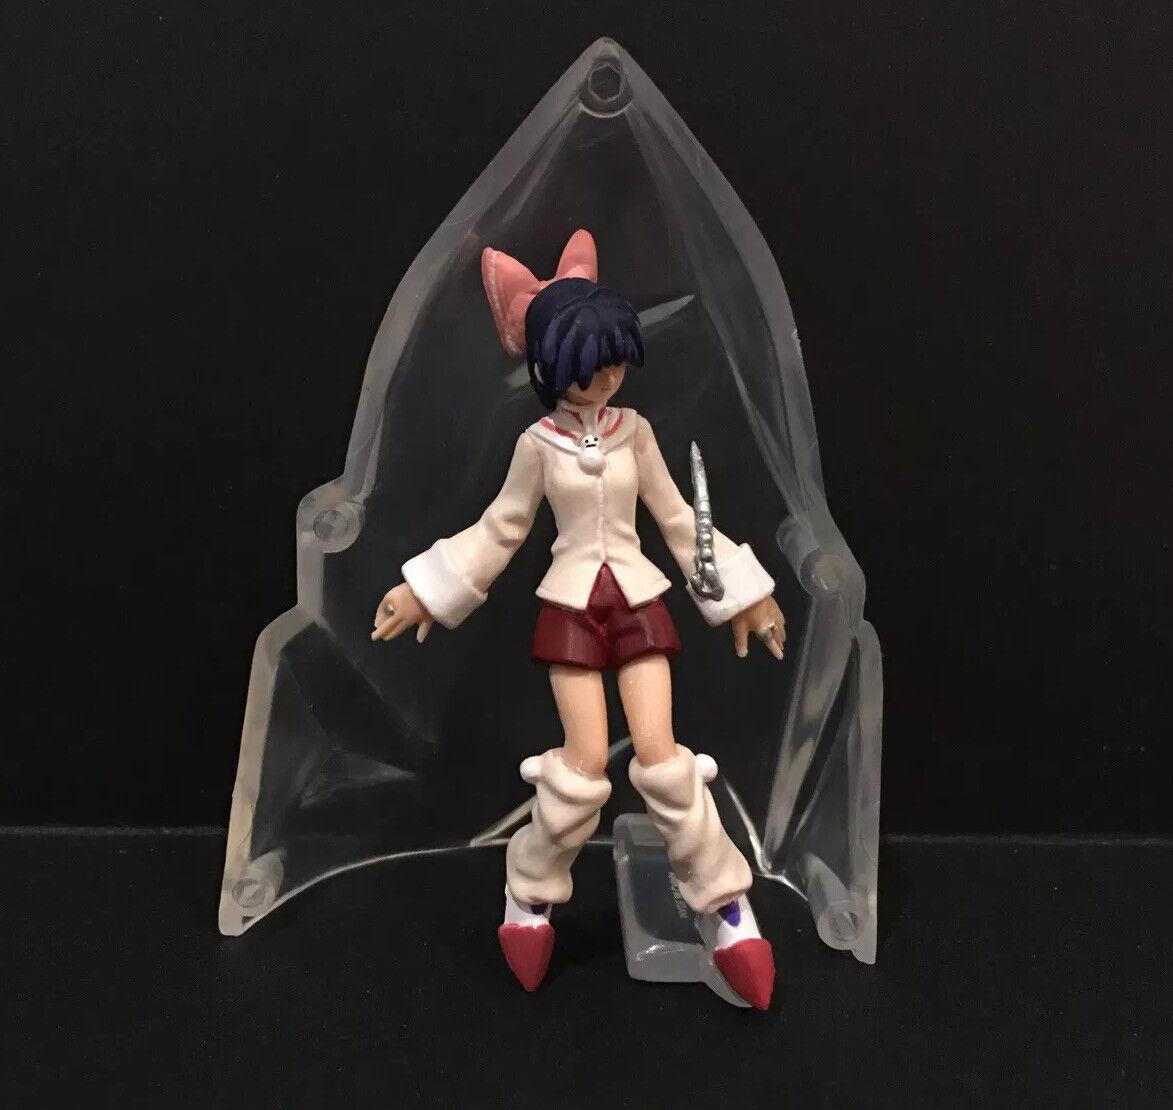 Konami Marchen Awakens Romance MAR Japan Exclusive Phantom Figure W//Card